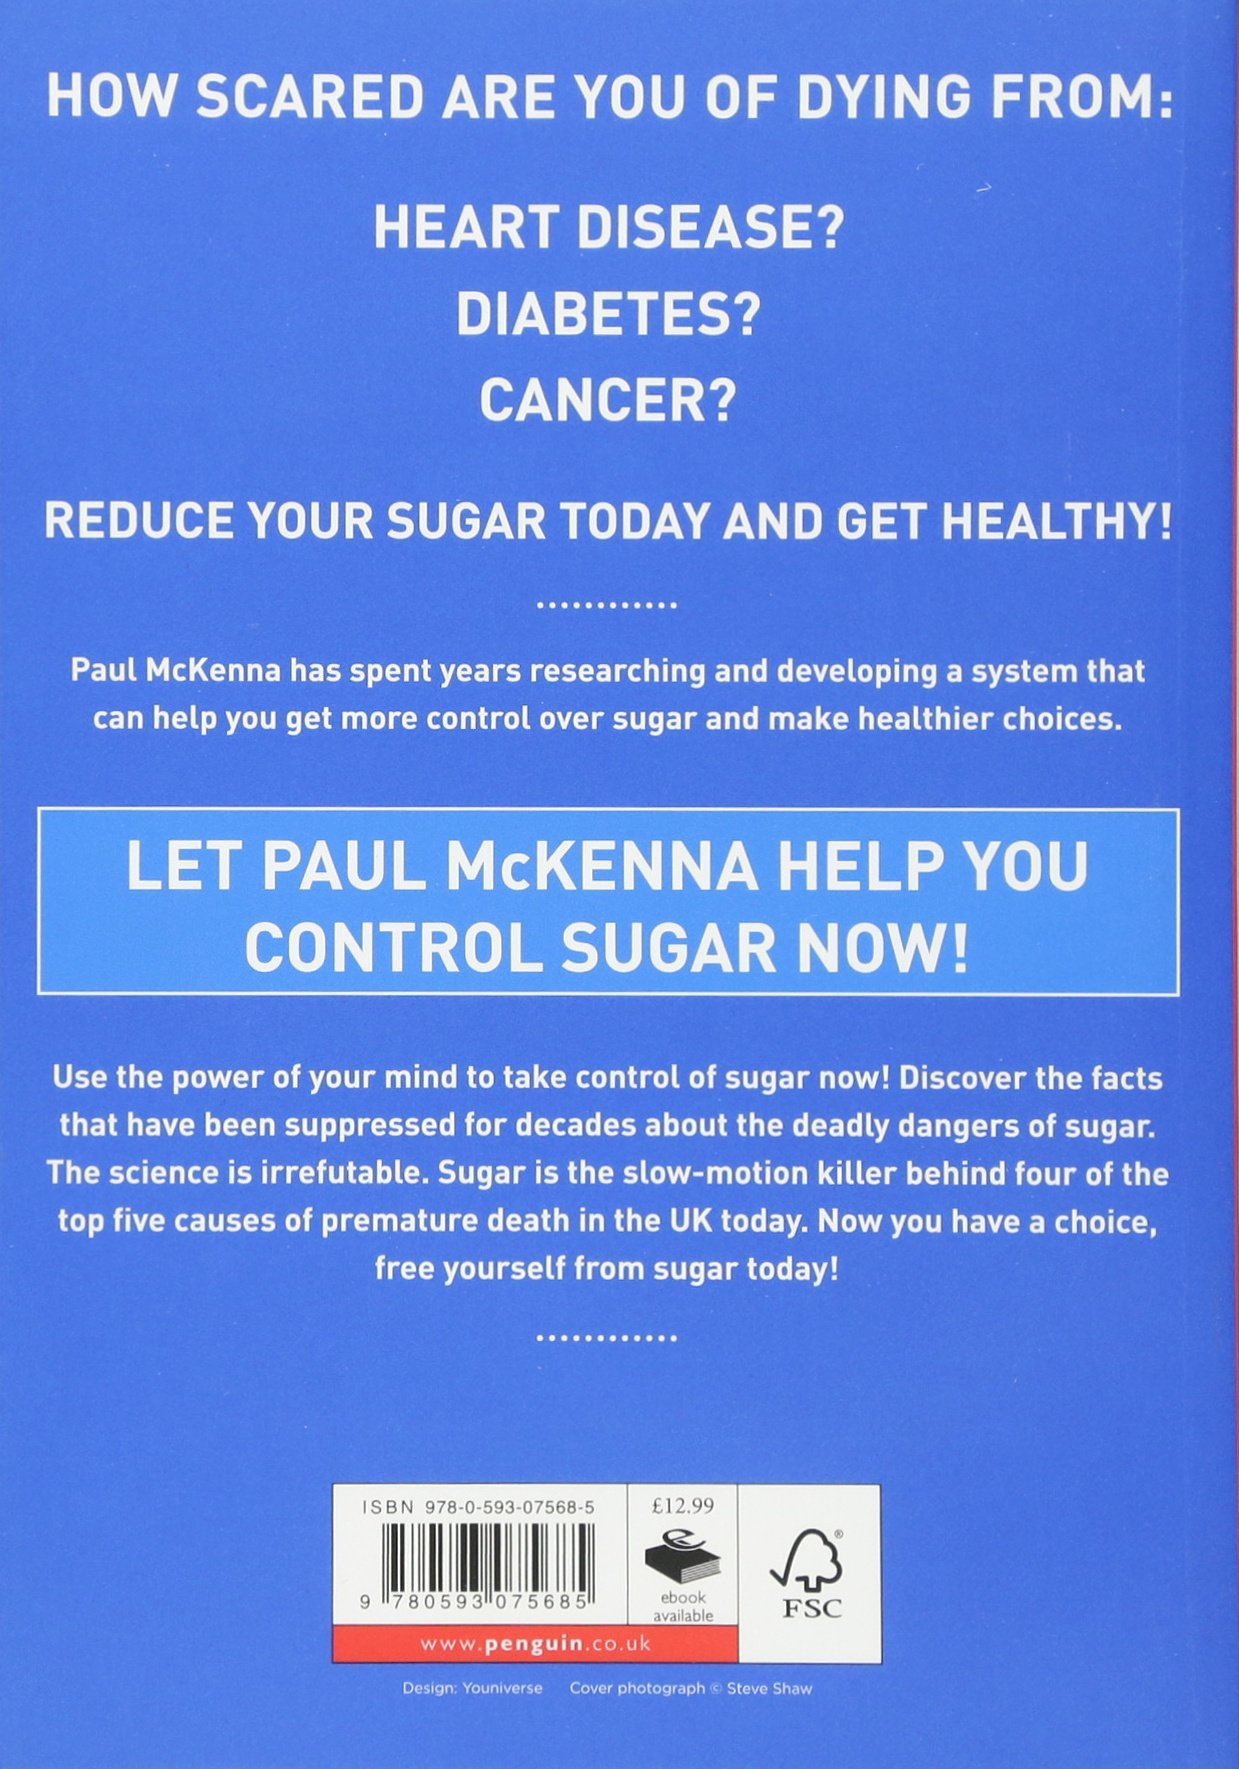 Can Paul McKenna Fix YOUR Sugar Addiction pics